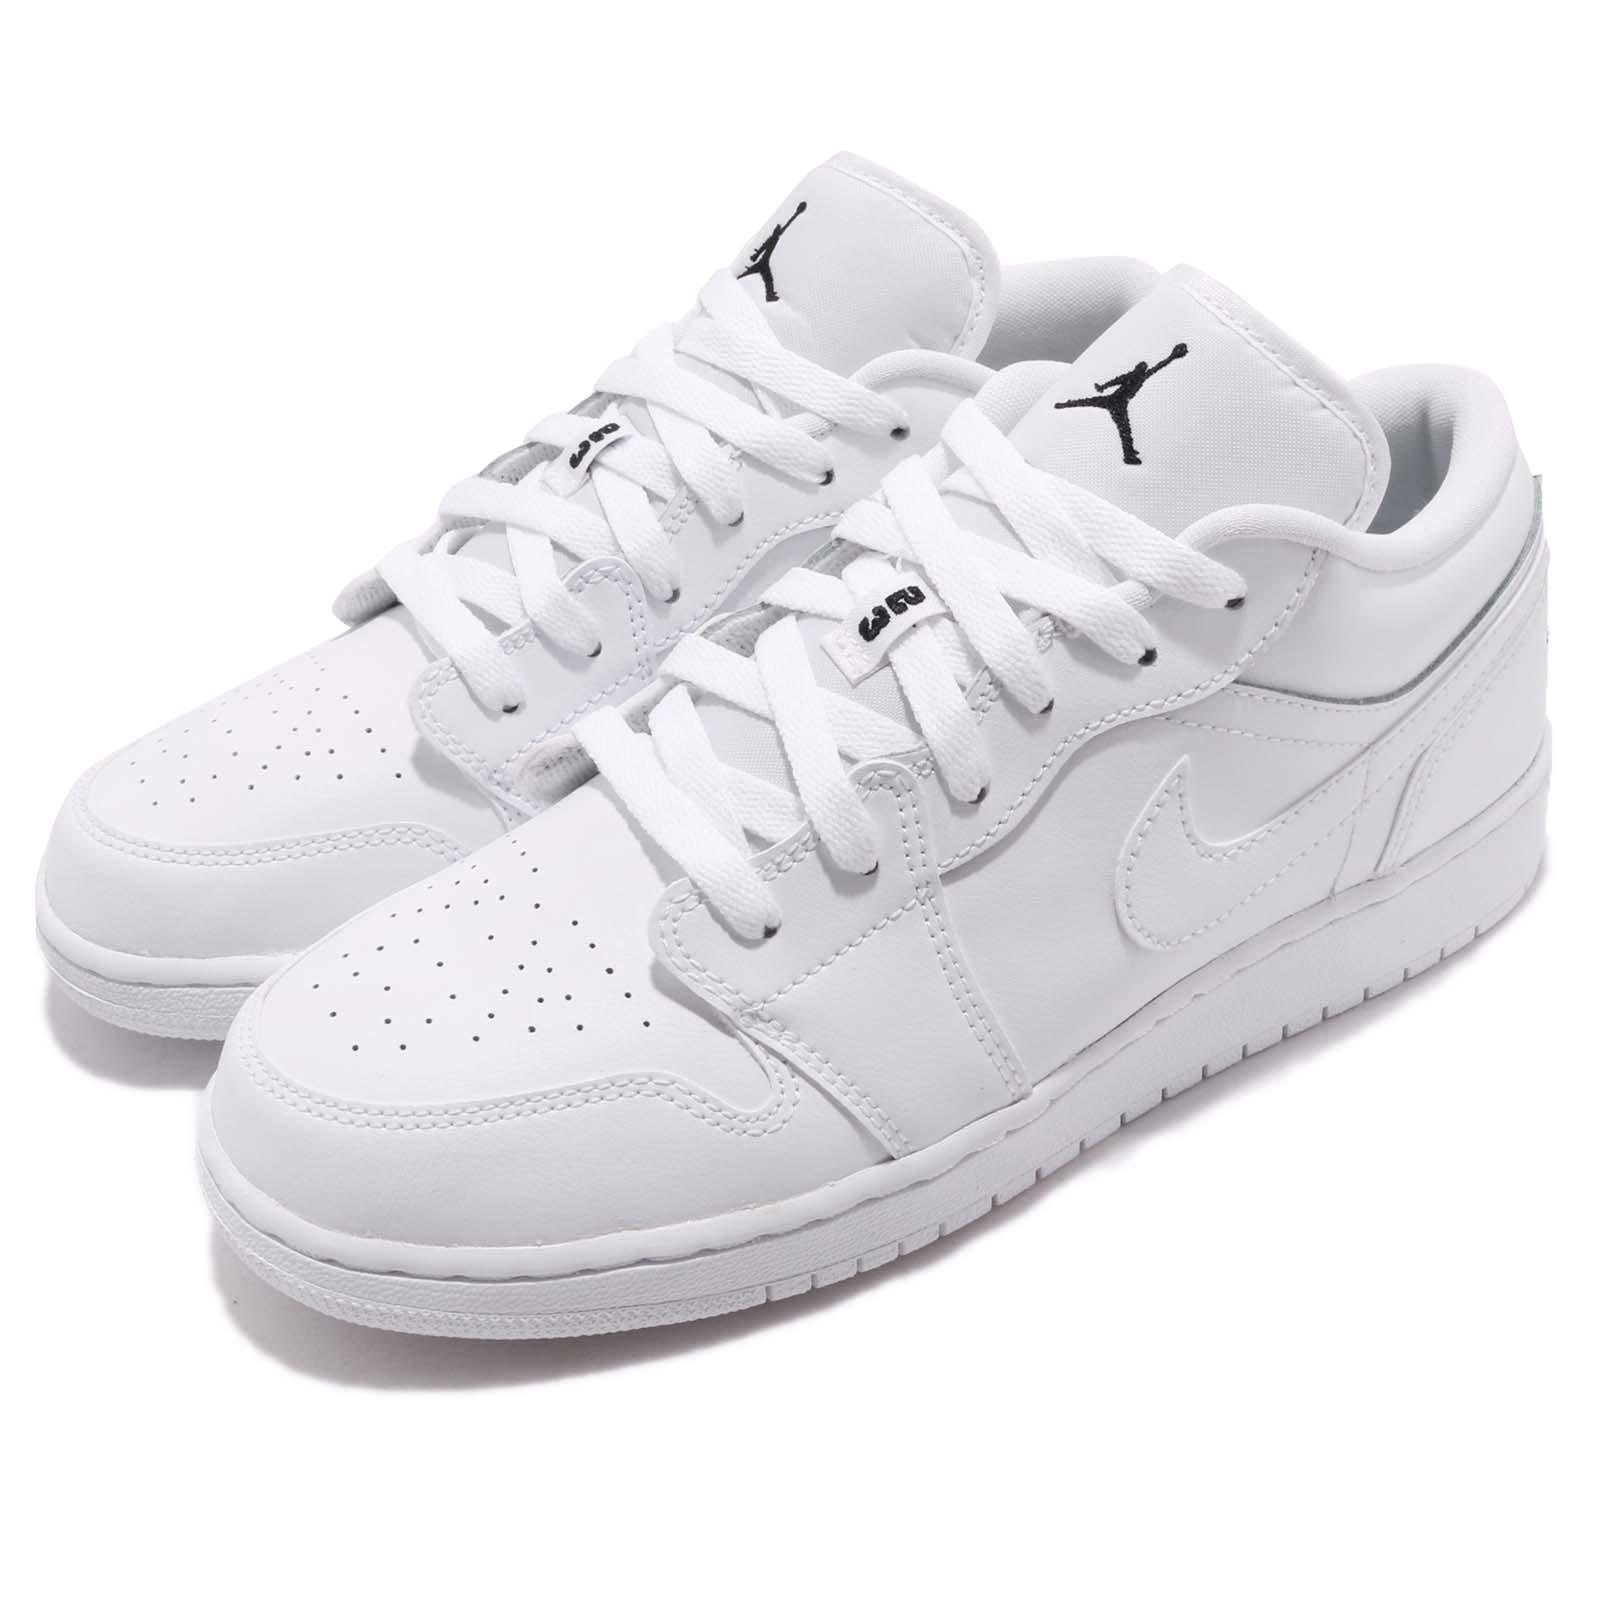 Nike Air Jordan 1代 GS 女鞋 553560-101